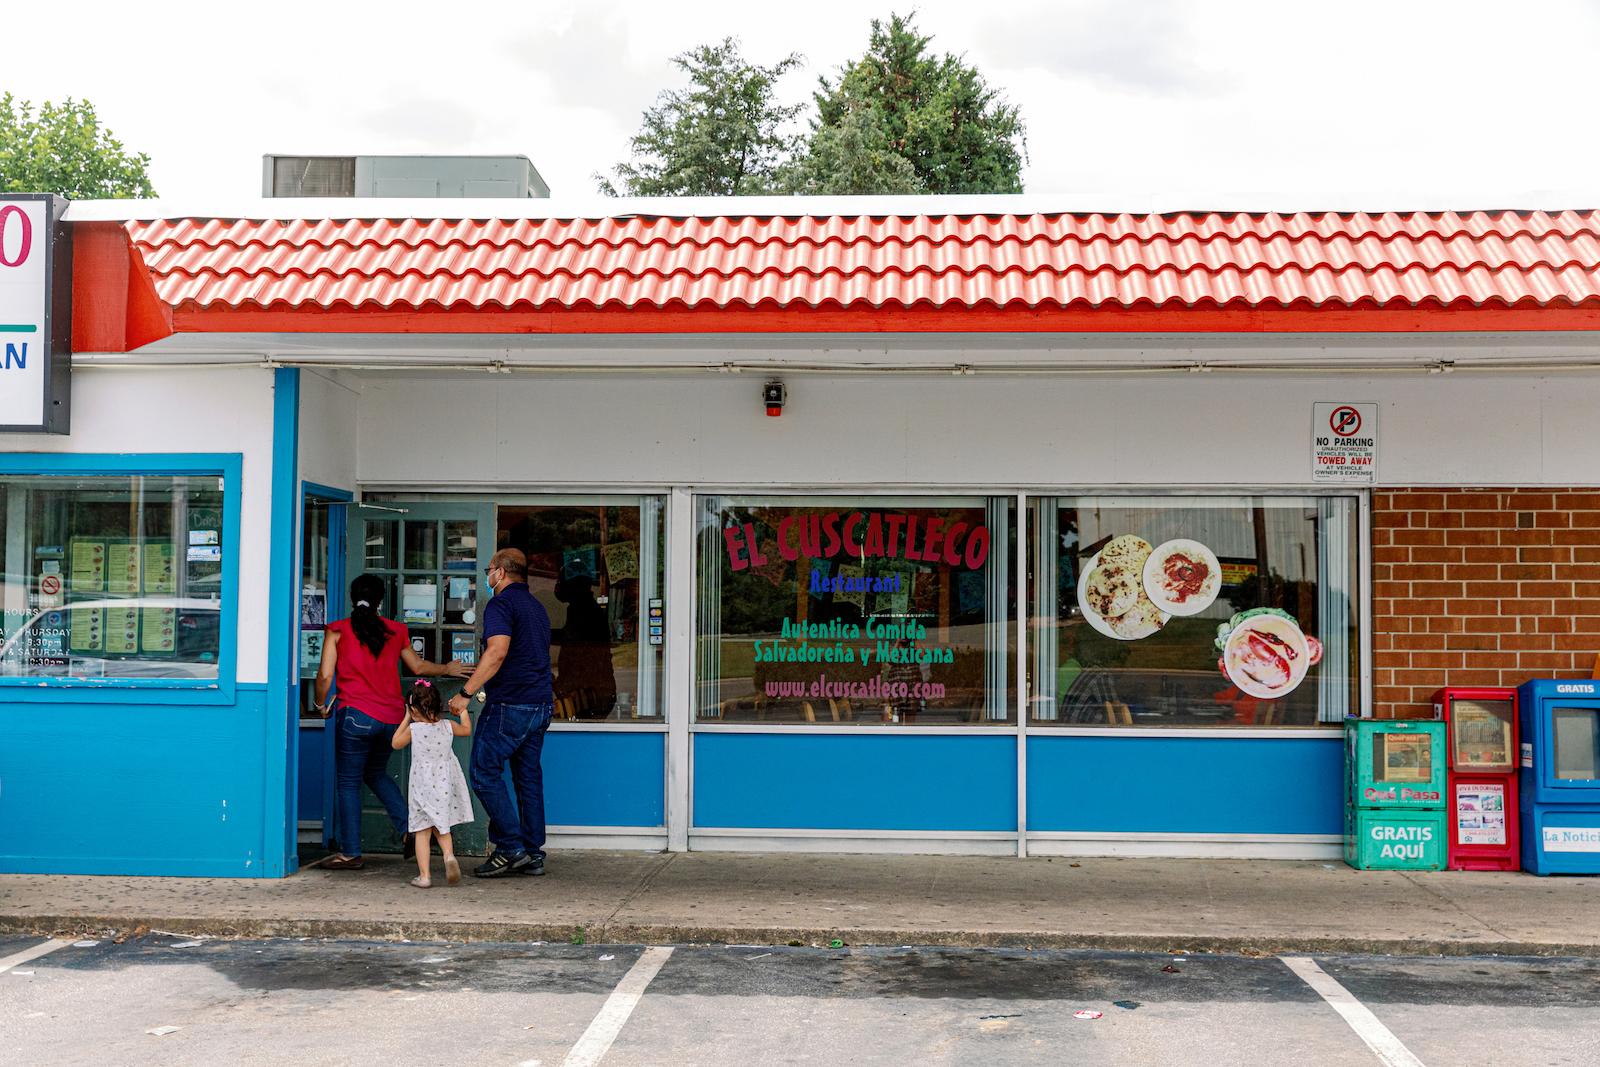 El Cuscatleco brings the flavors of El Salvador to Durham